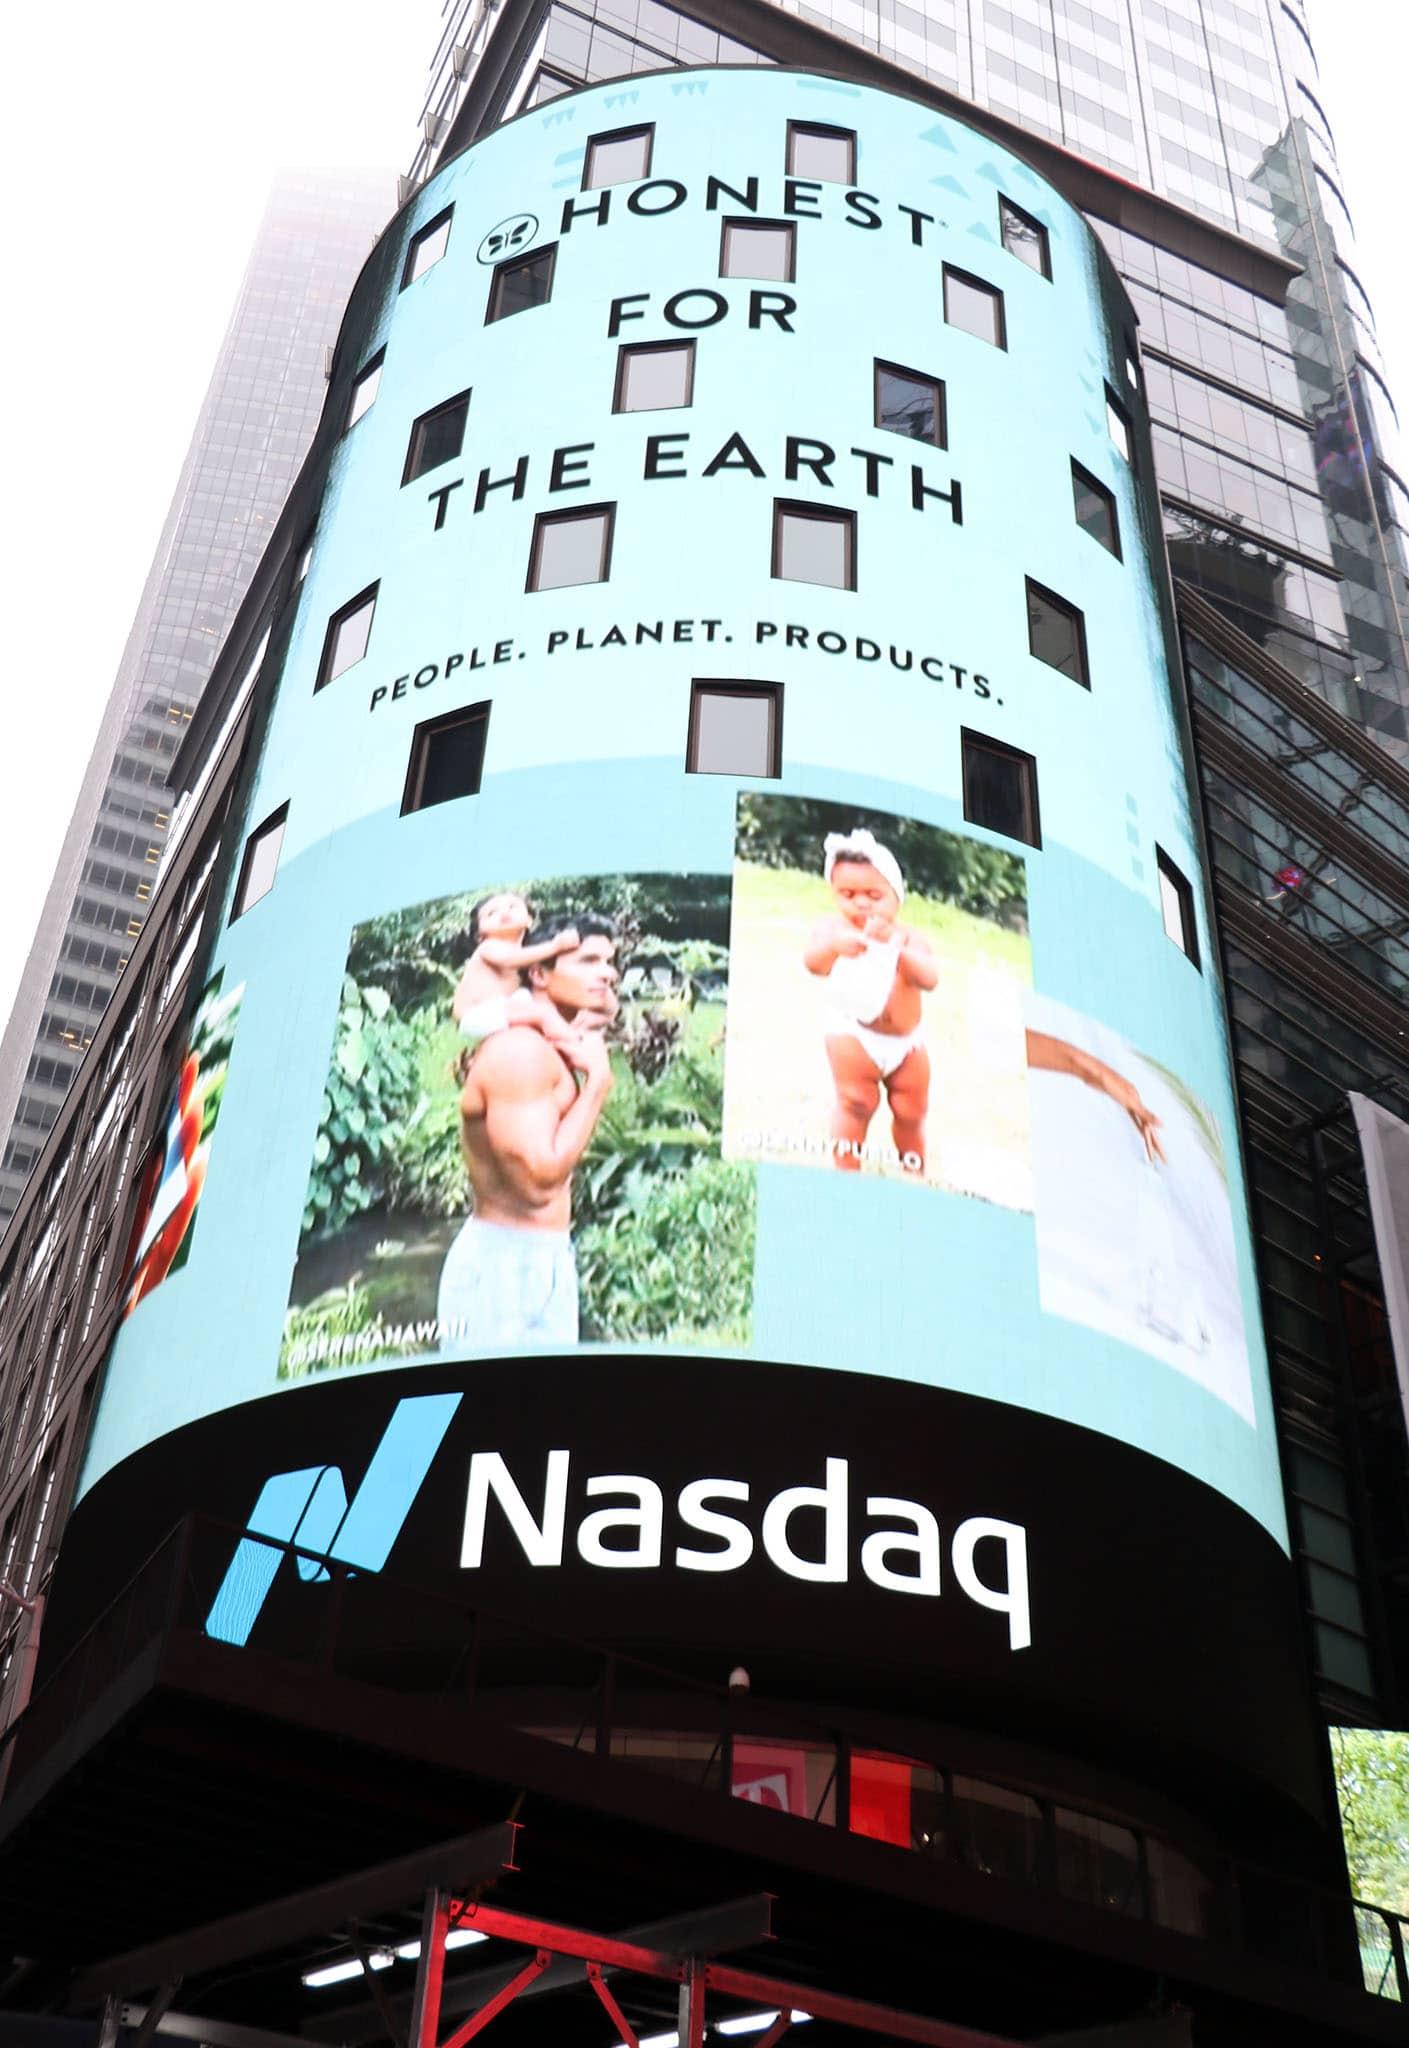 The Honest Company's Nasdaq billboard in Times Square New York